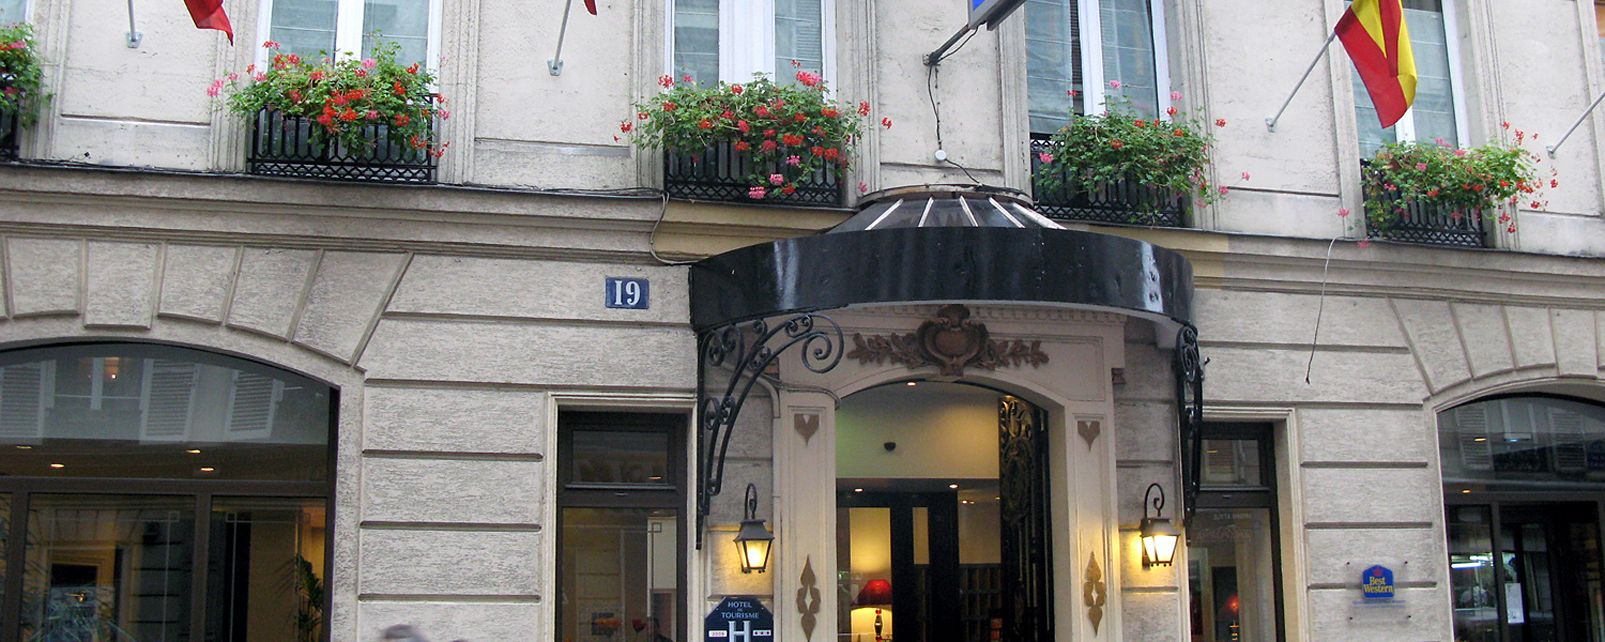 Hôtel Printania Republique